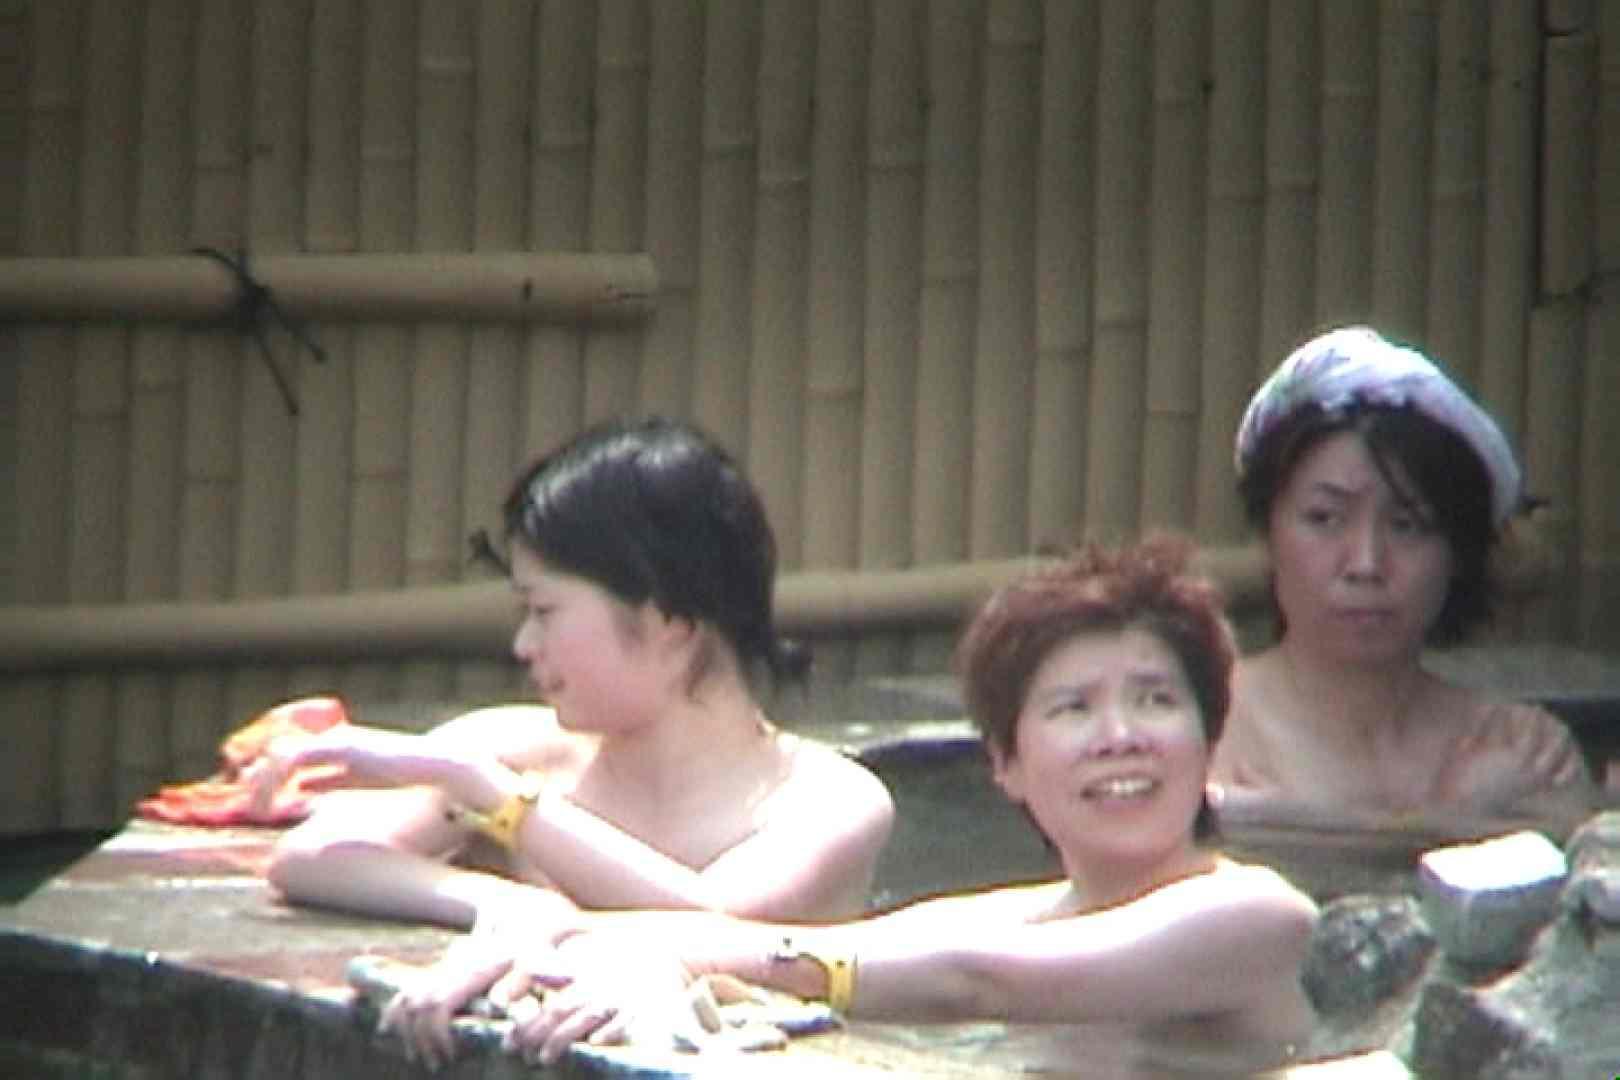 Aquaな露天風呂Vol.54【VIP限定】 露天風呂突入 | 美しいOLの裸体  88pic 46